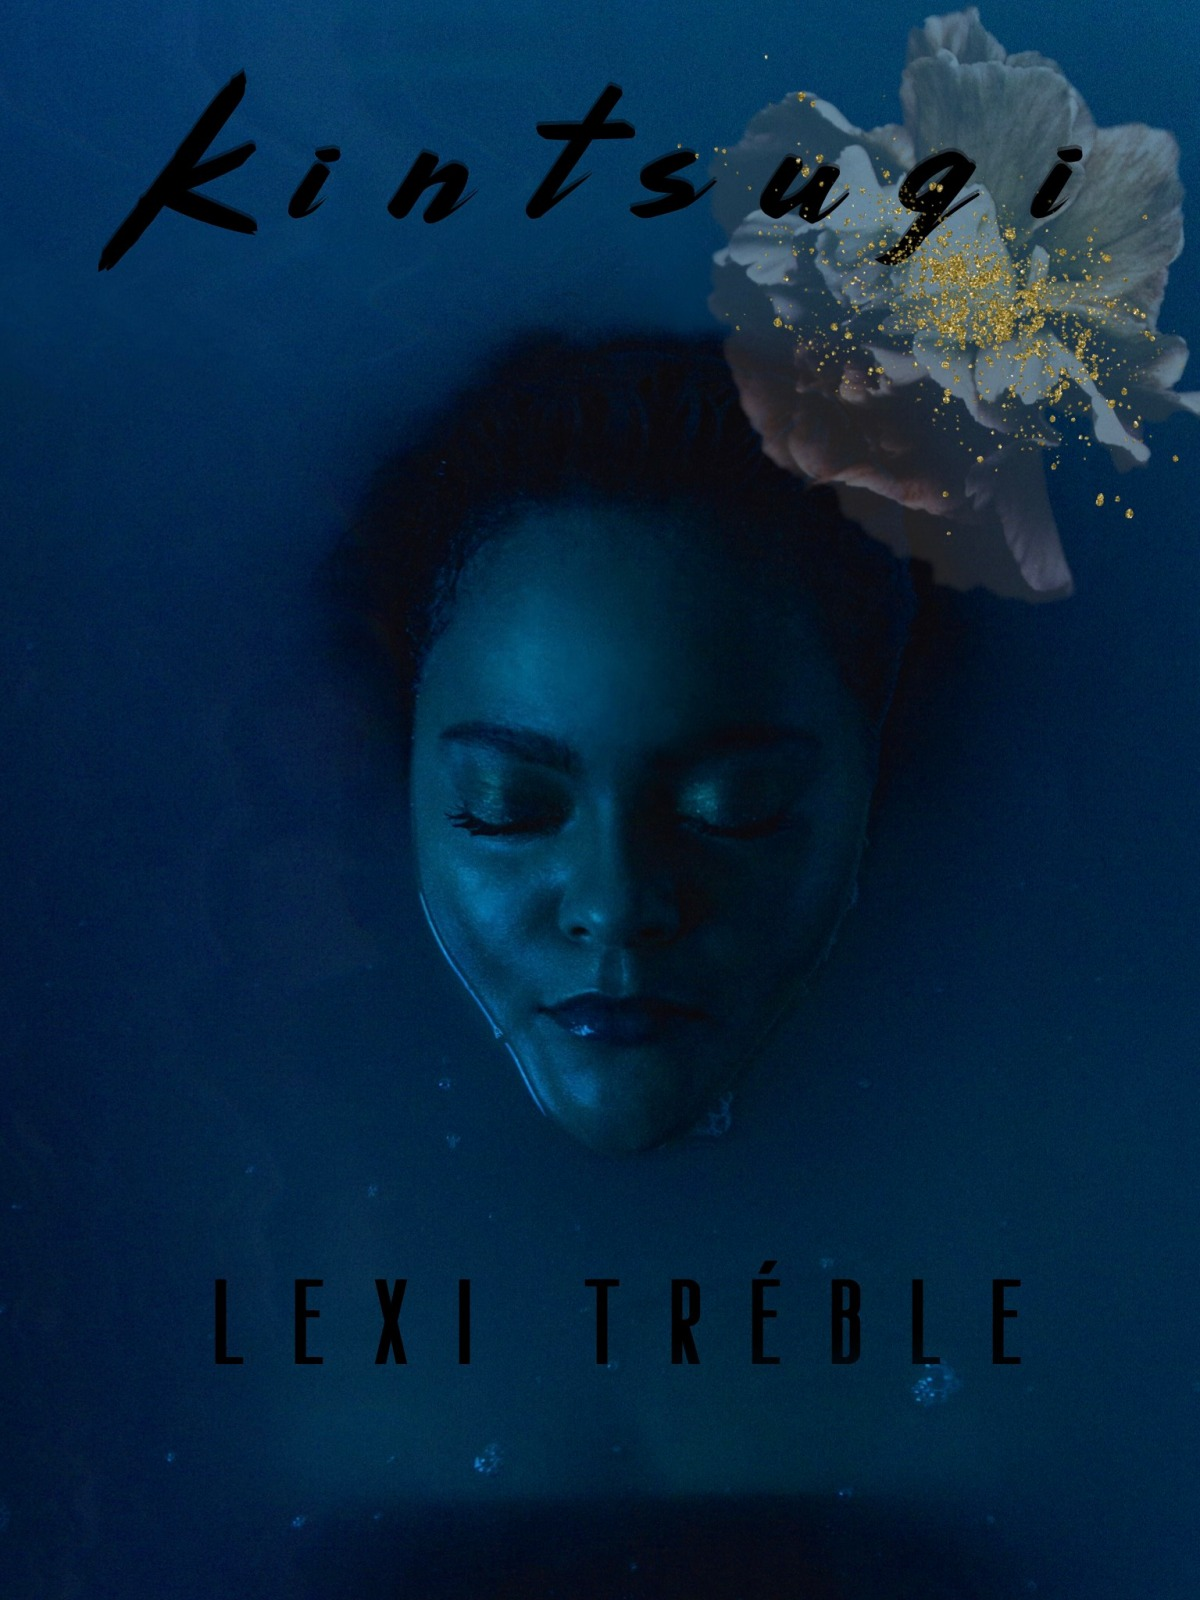 #NewMusicFriday Kintsugi EP by LexiTréble!